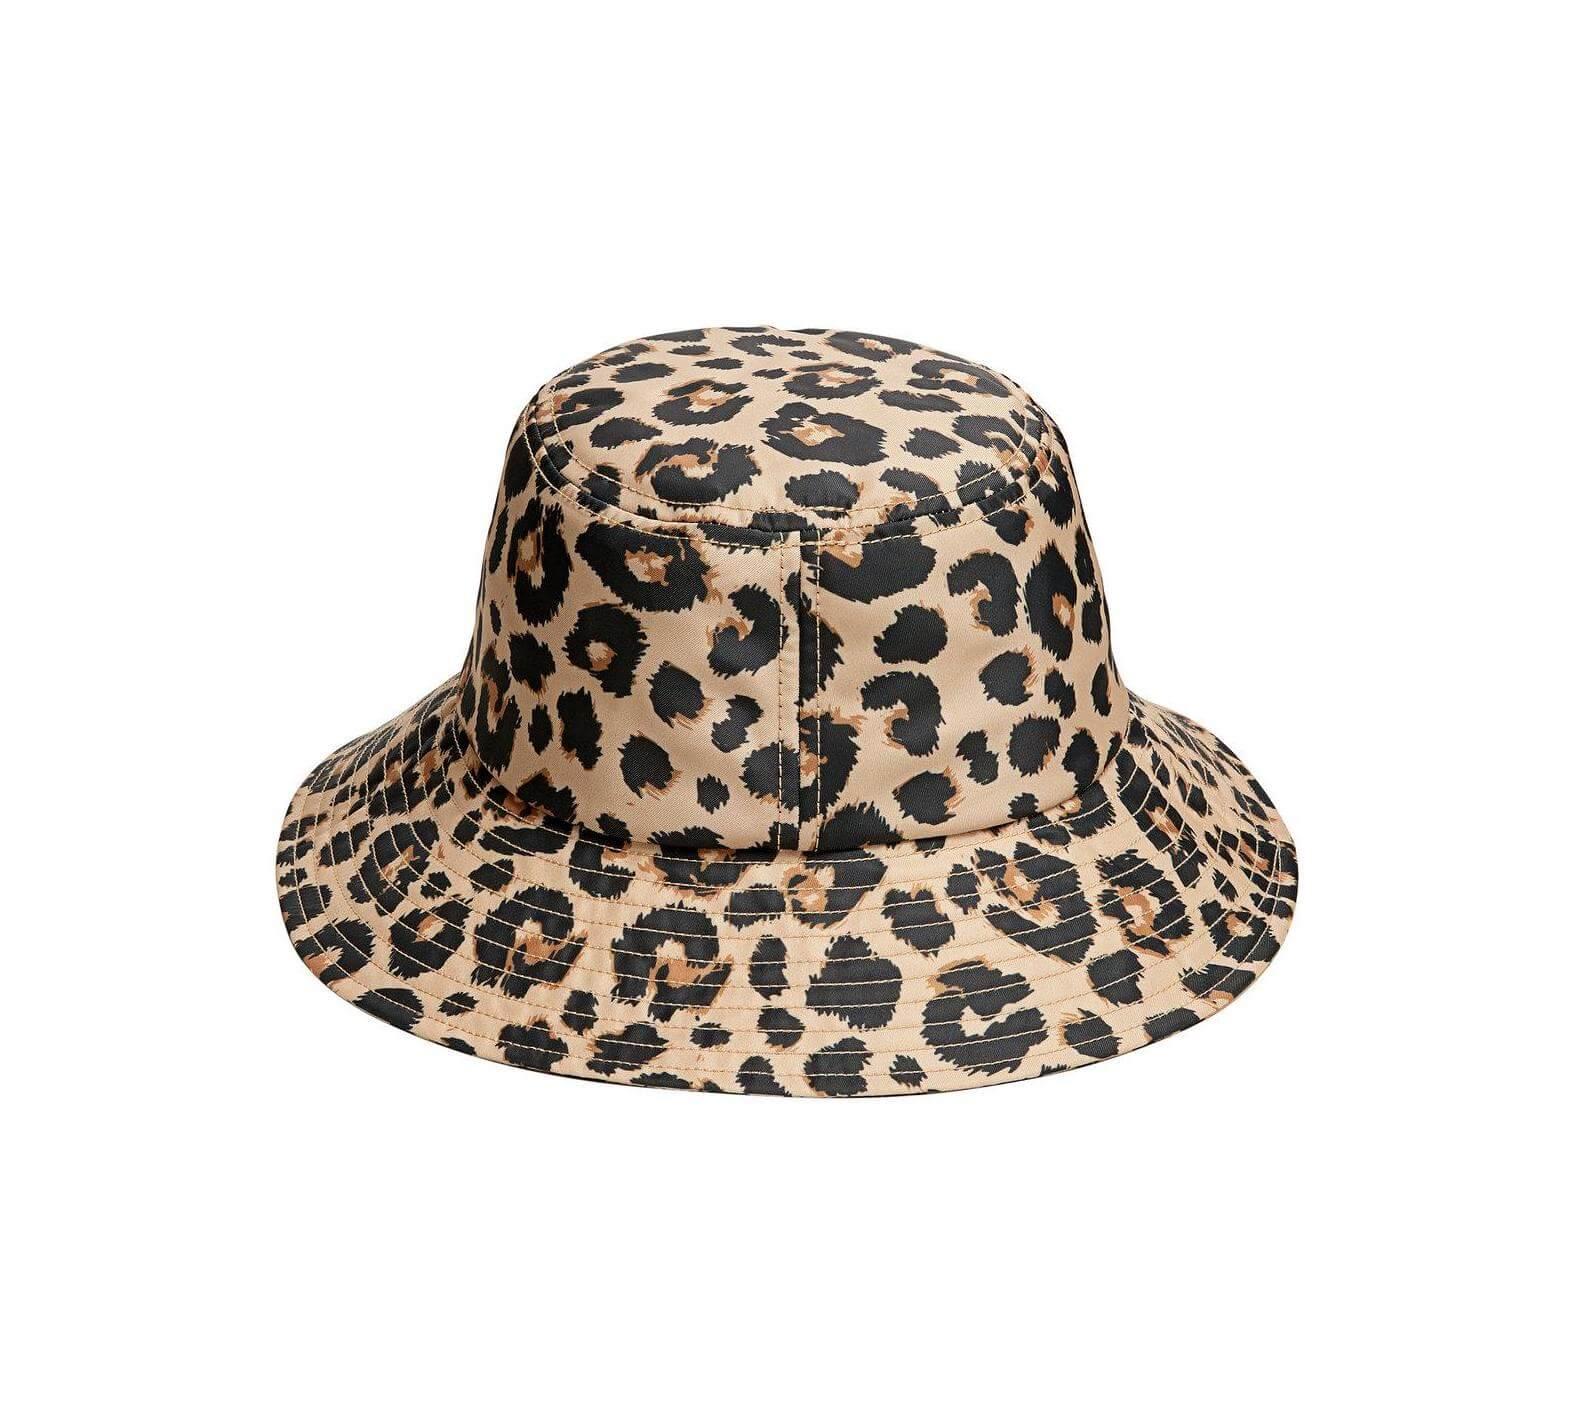 Loeffler Randall - Leopard-print shell bucket hat